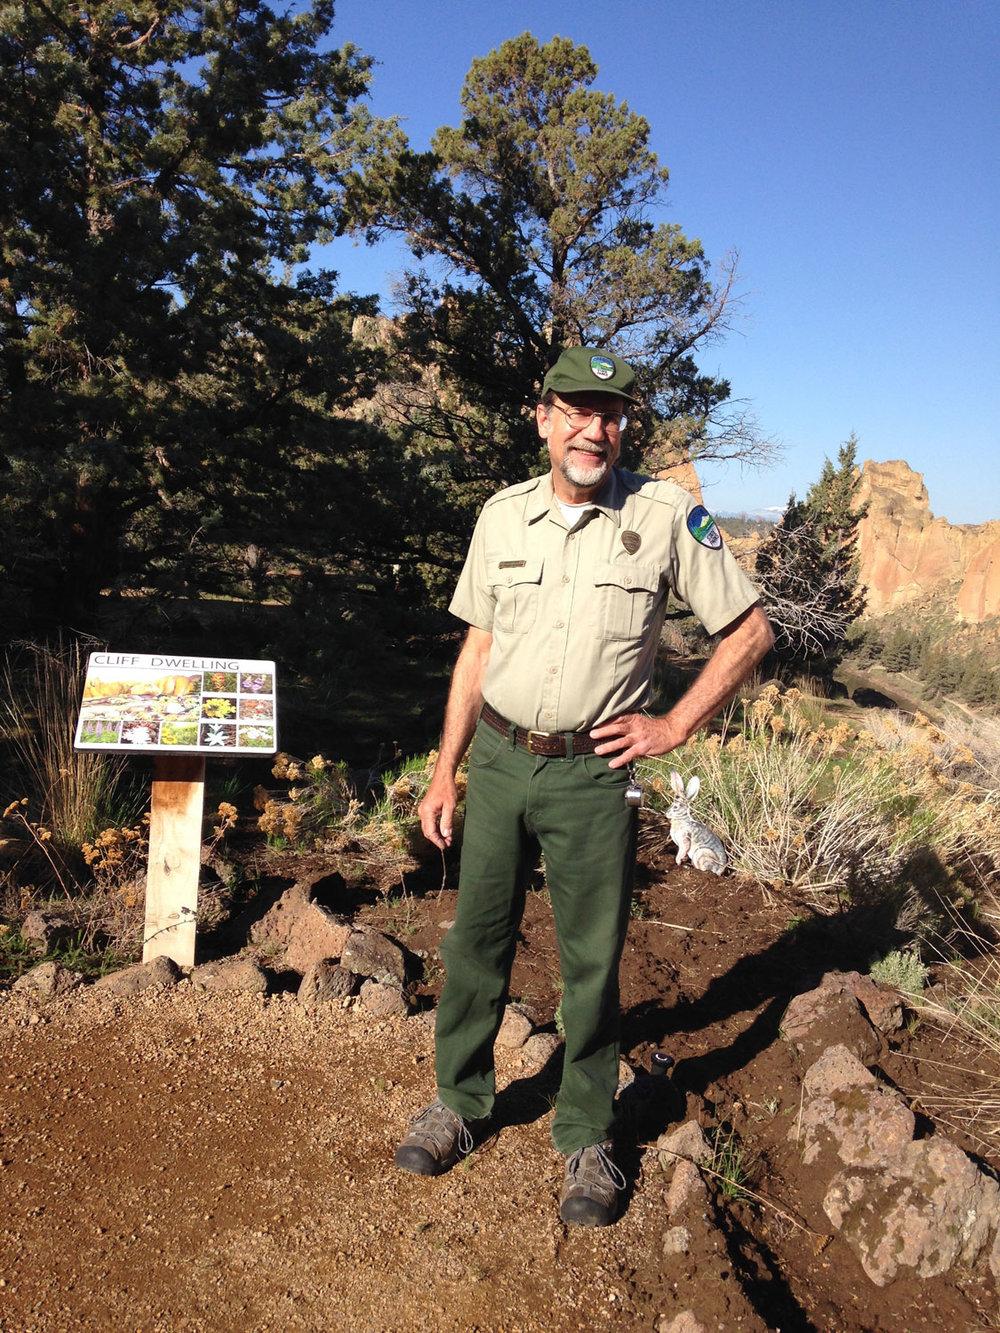 Smith Rock State Park Interpretative Naturalist David Vick